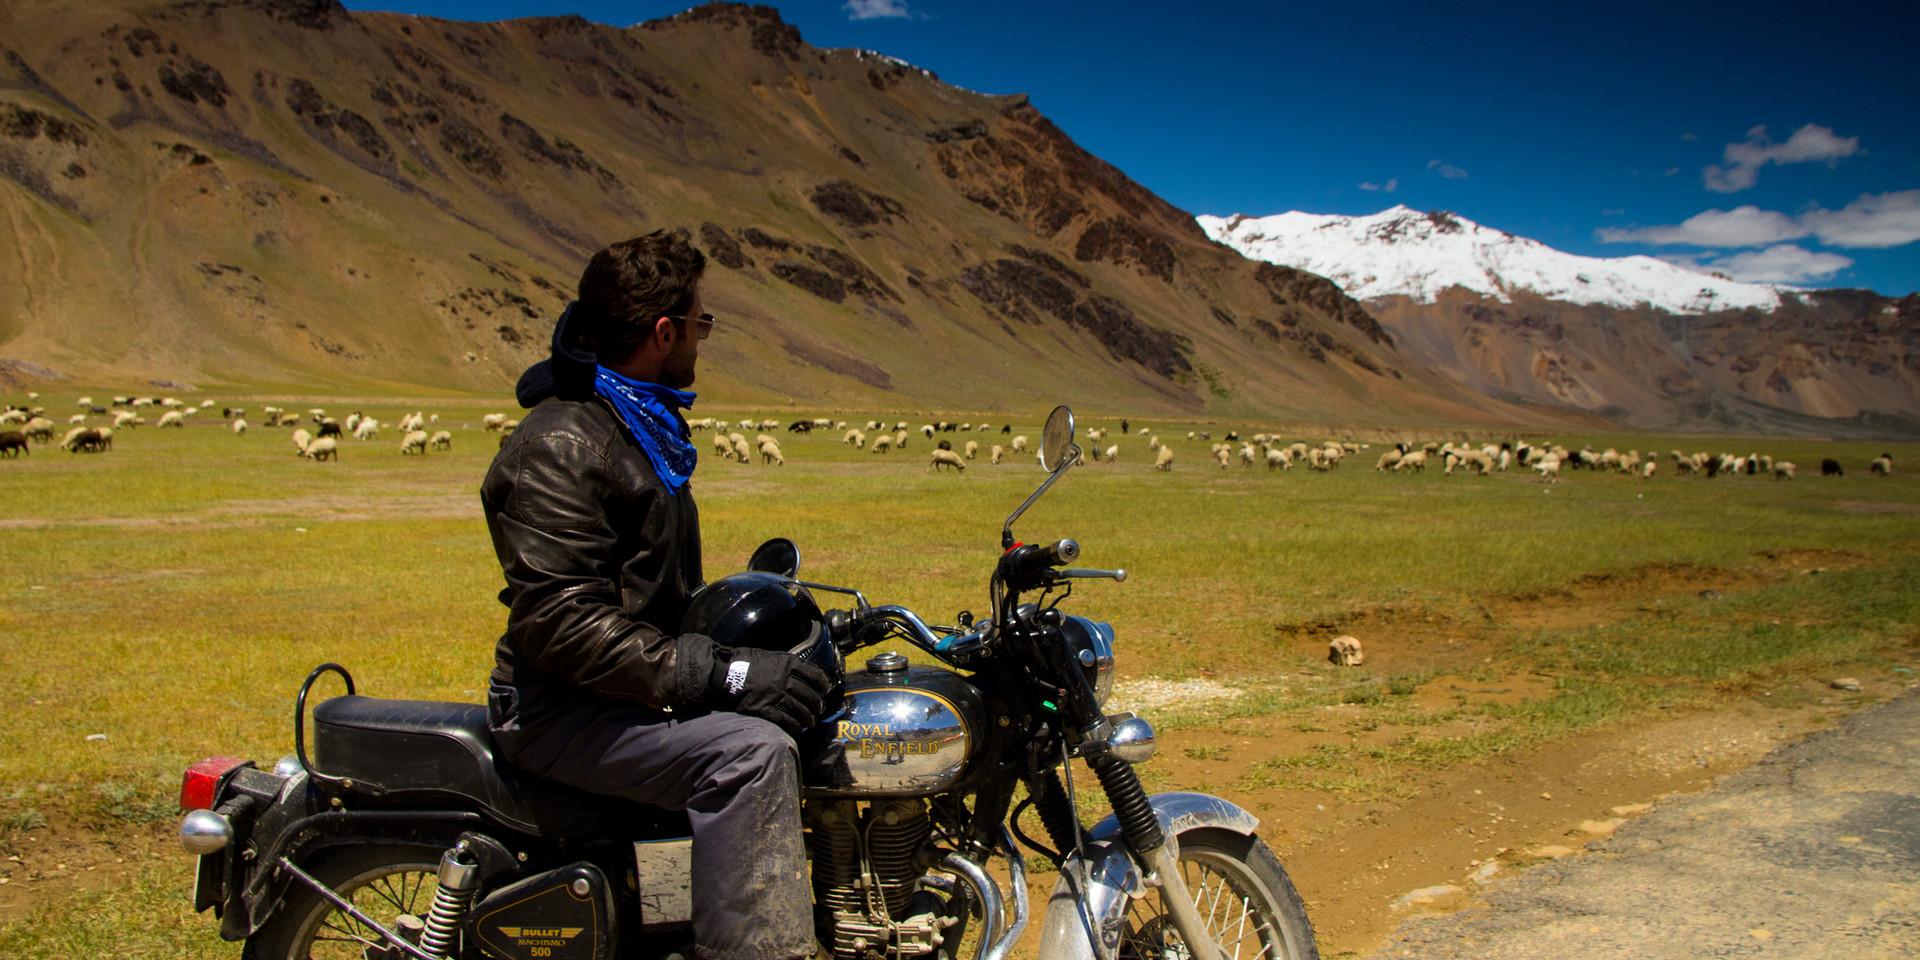 The epic Manali-Ladakh trip on a Royal Enfield motorcycle.